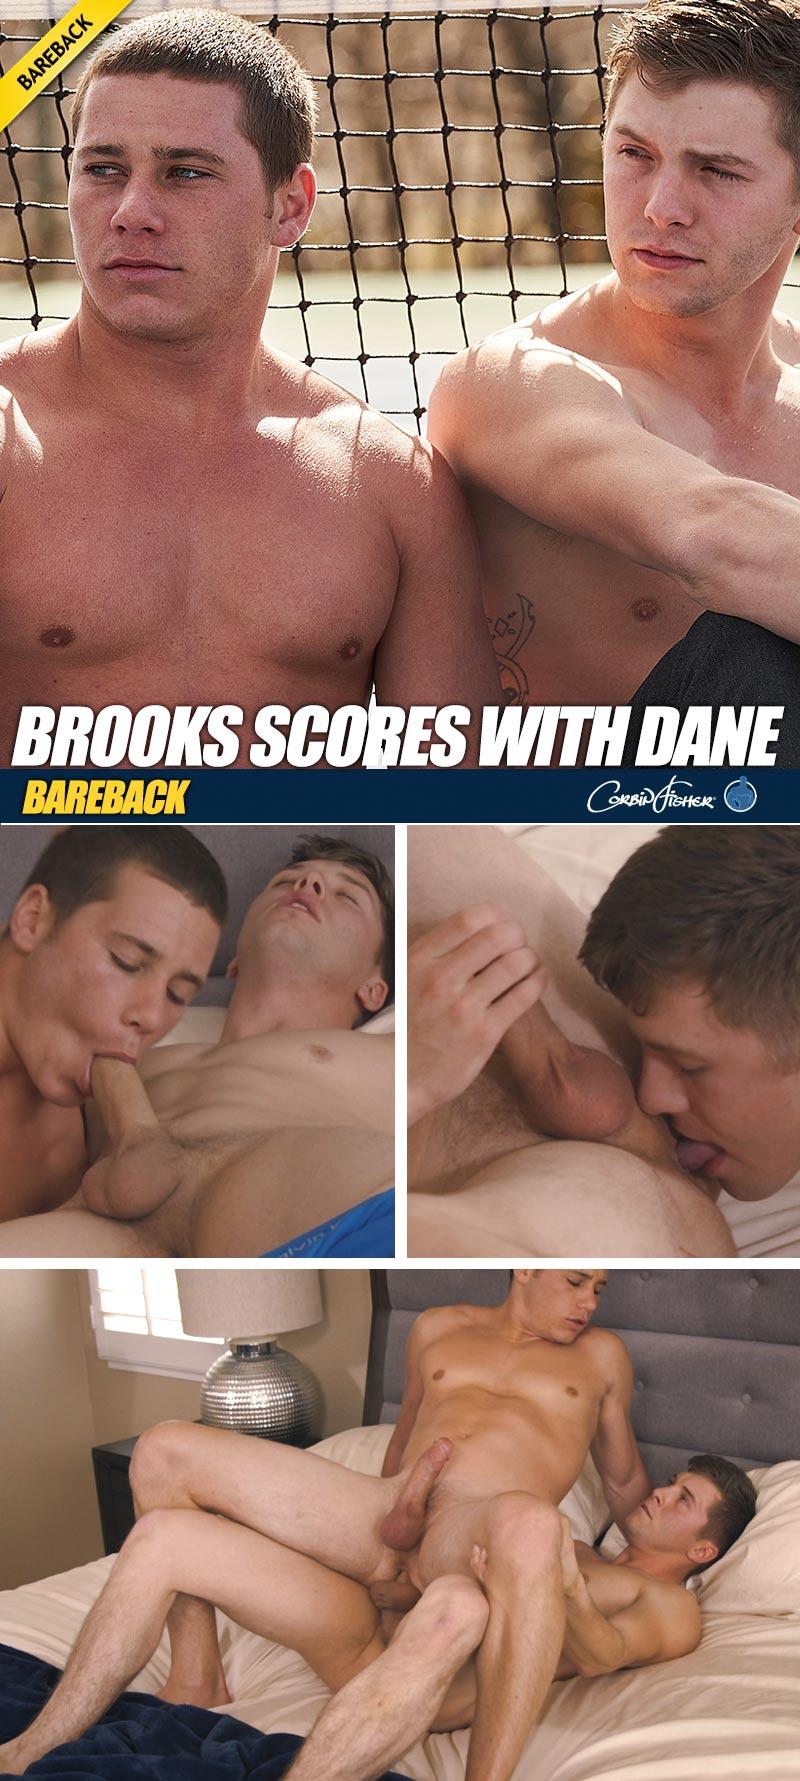 Brooks Scores With Dane [Bareback] at CorbinFisher